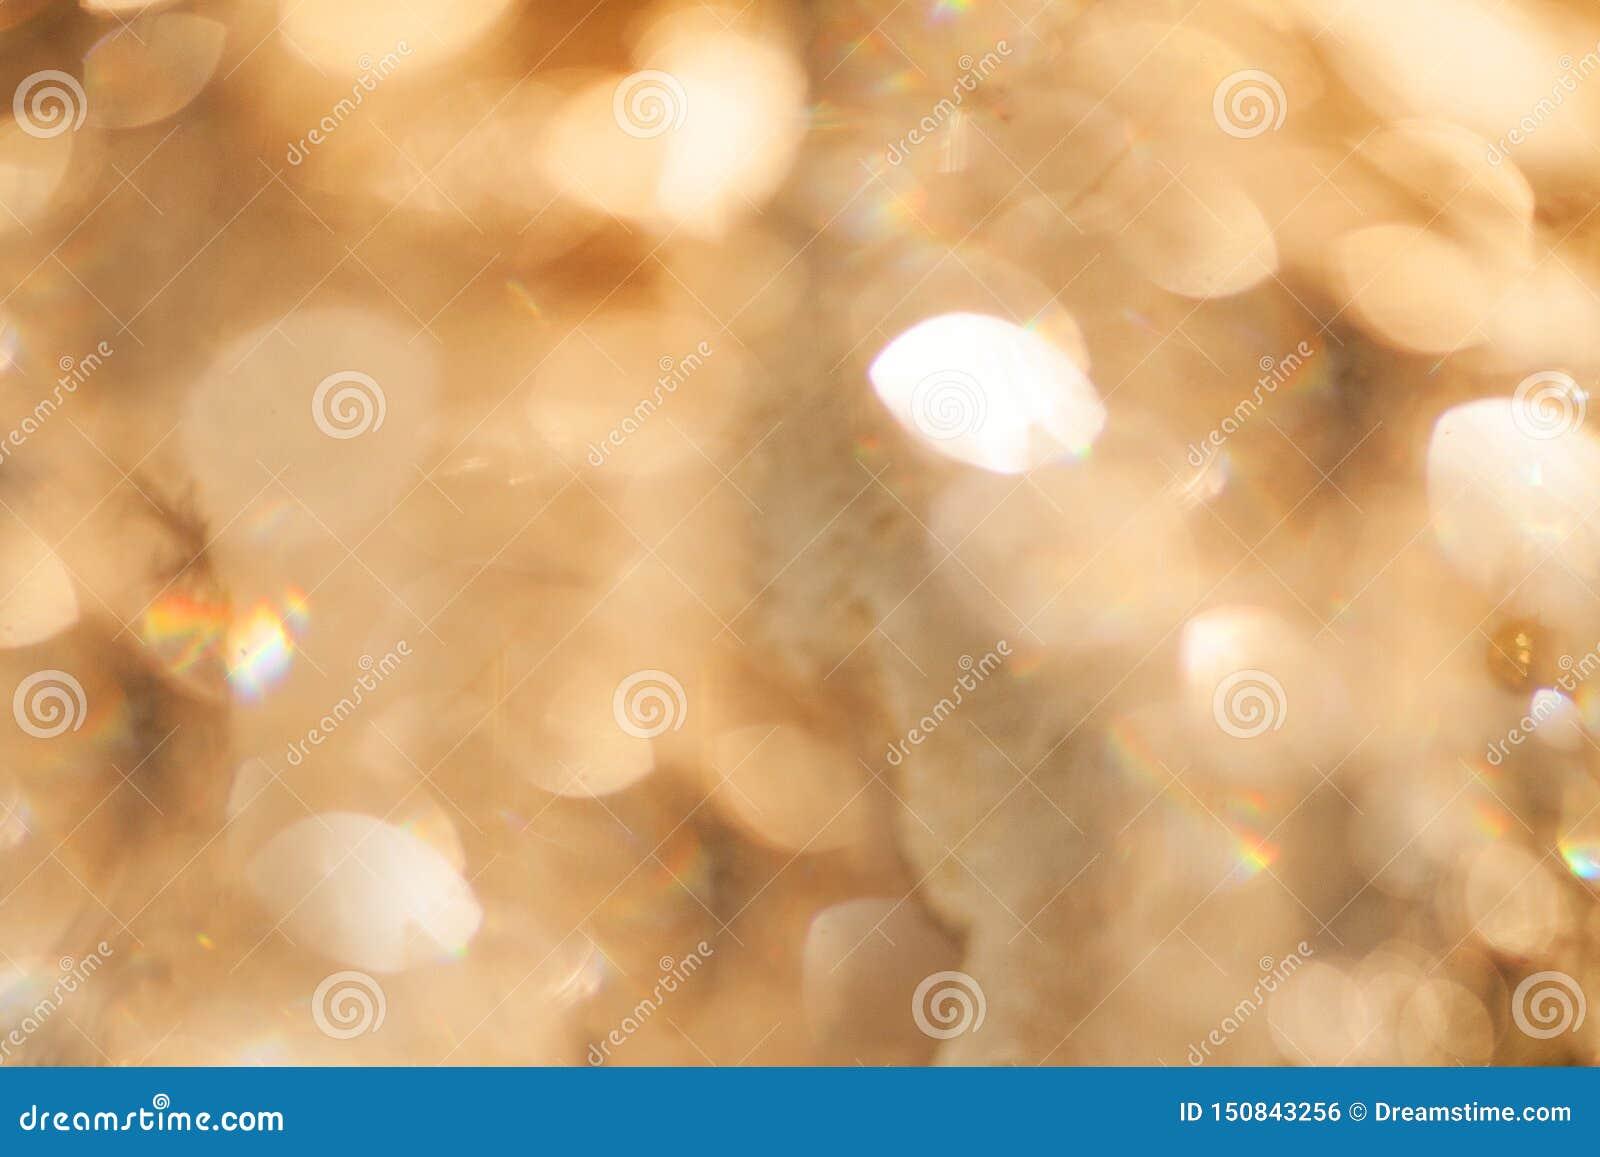 Abstract bokeh golden background texture